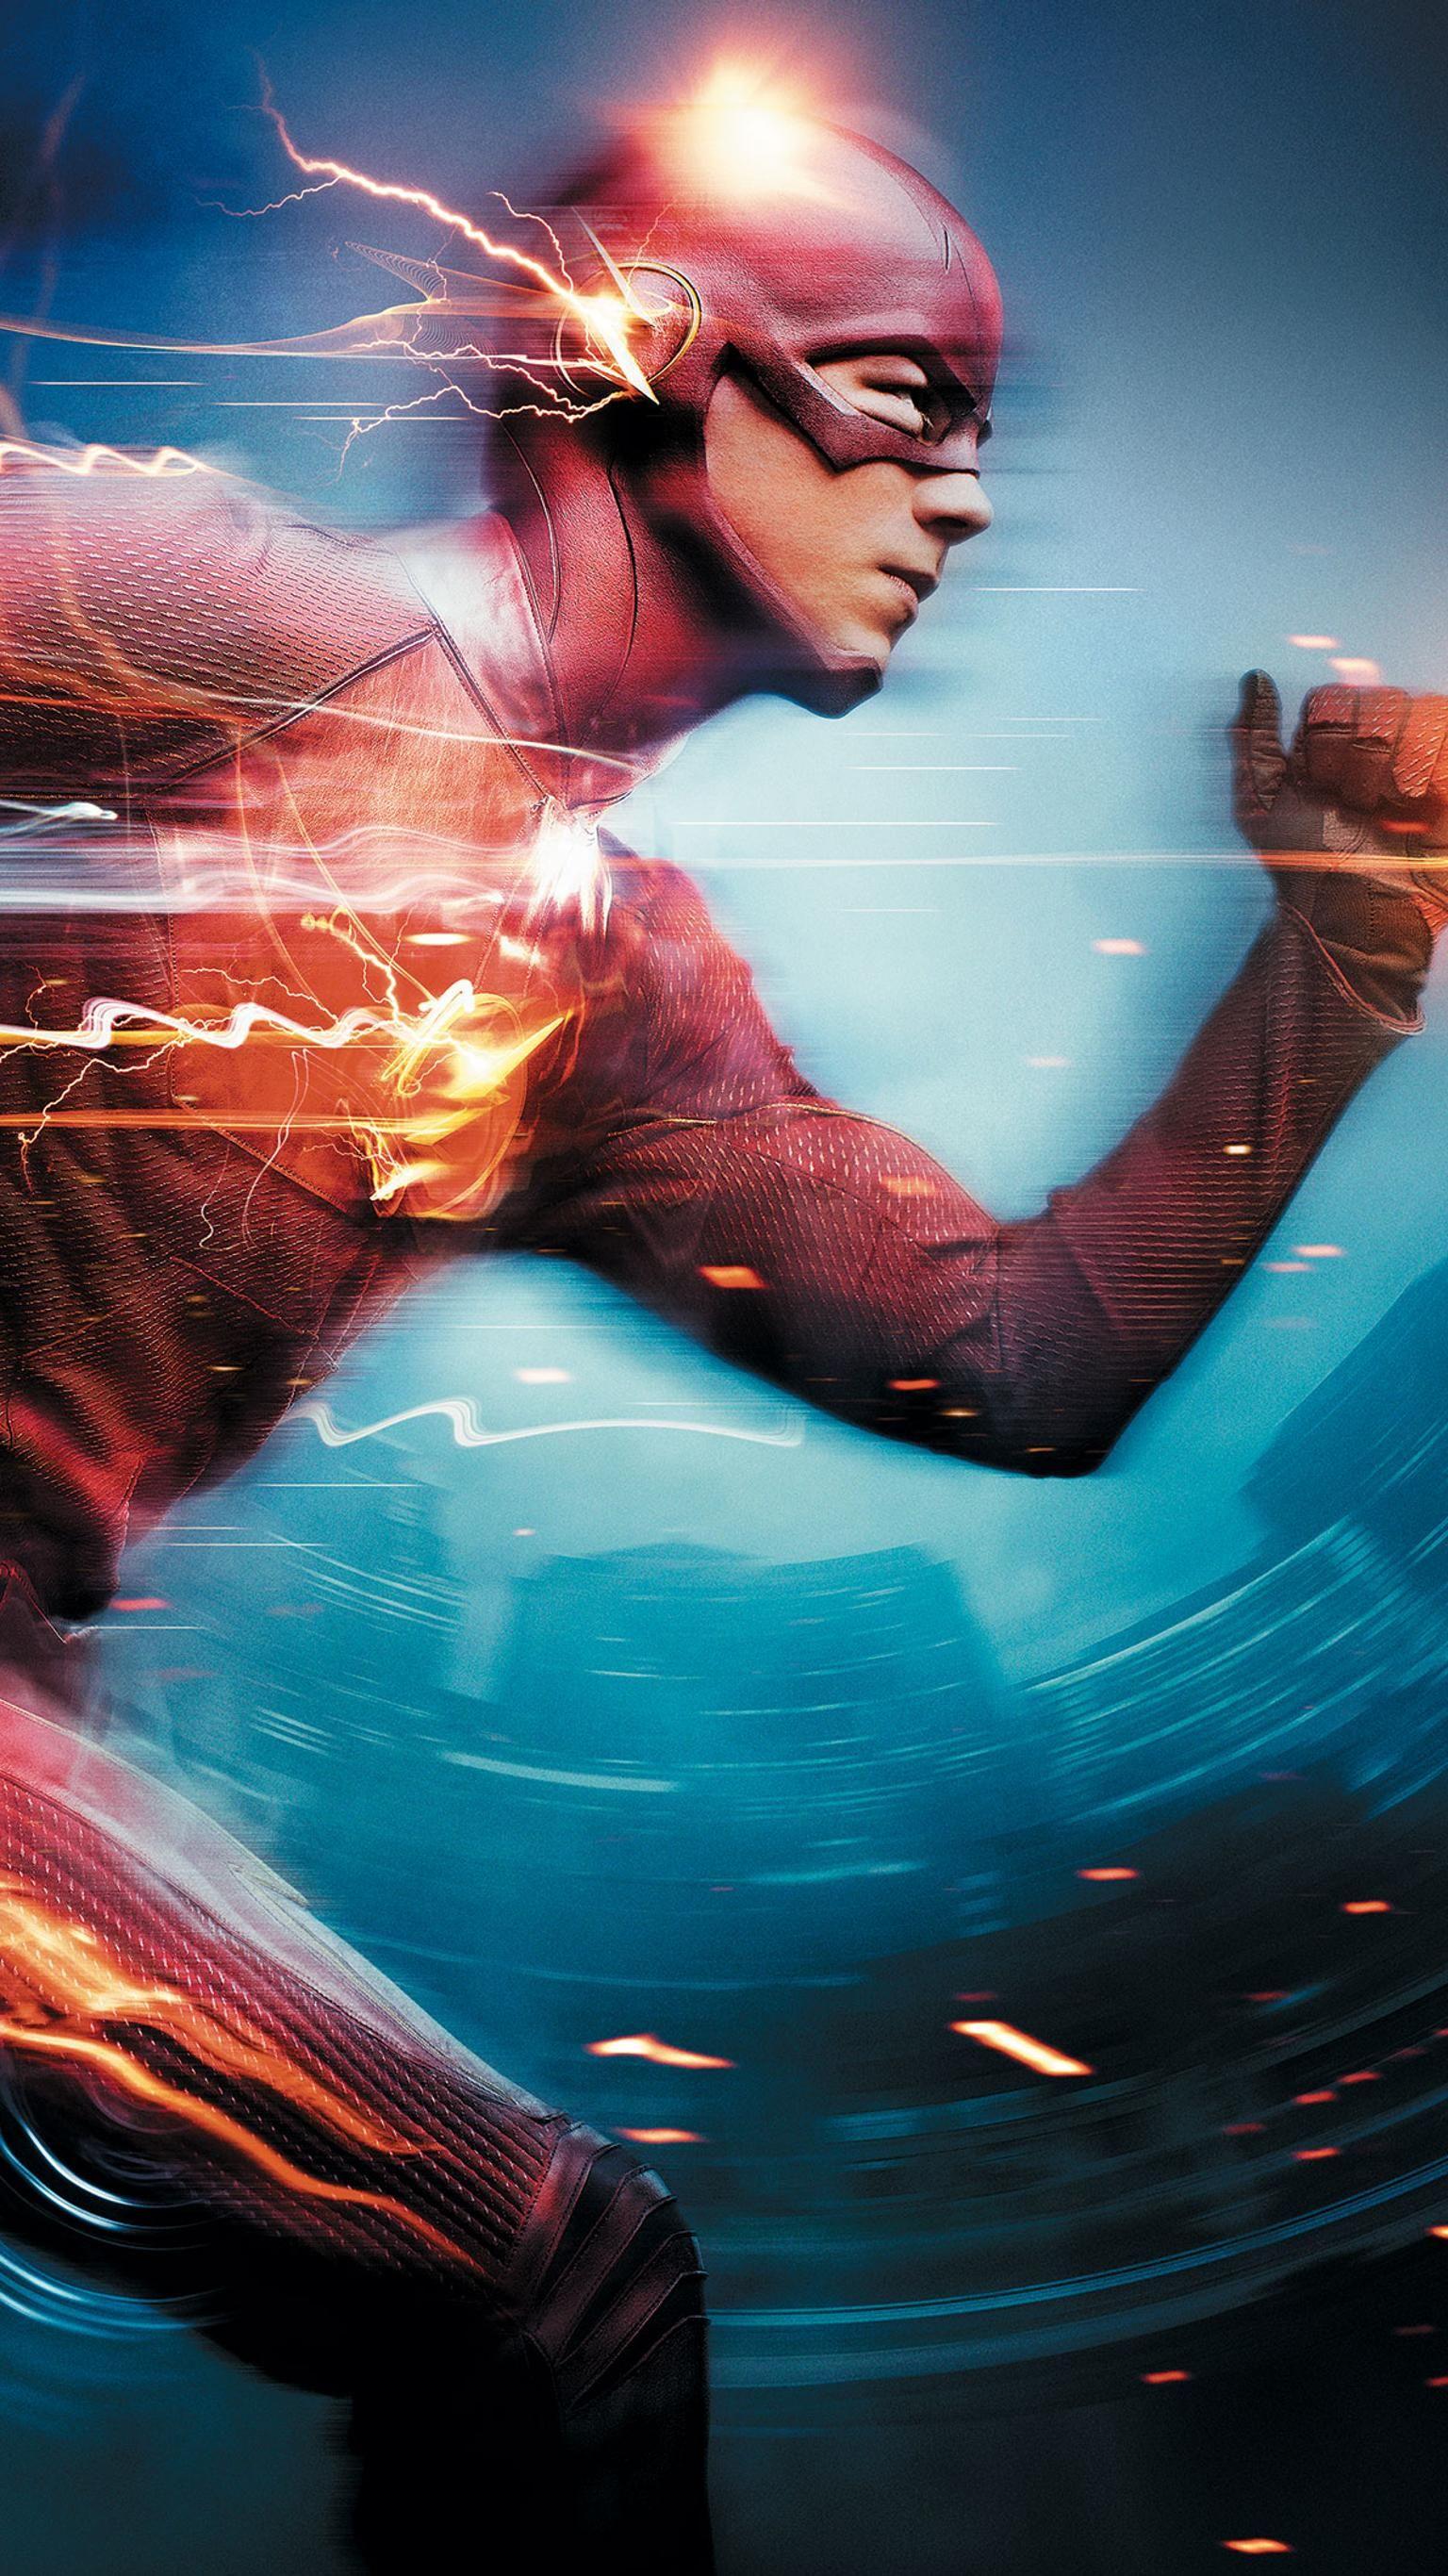 The Flash Phone Wallpaper Moviemania The Flash Poster Flash Wallpaper The Flash Flash phone wallpaper hd